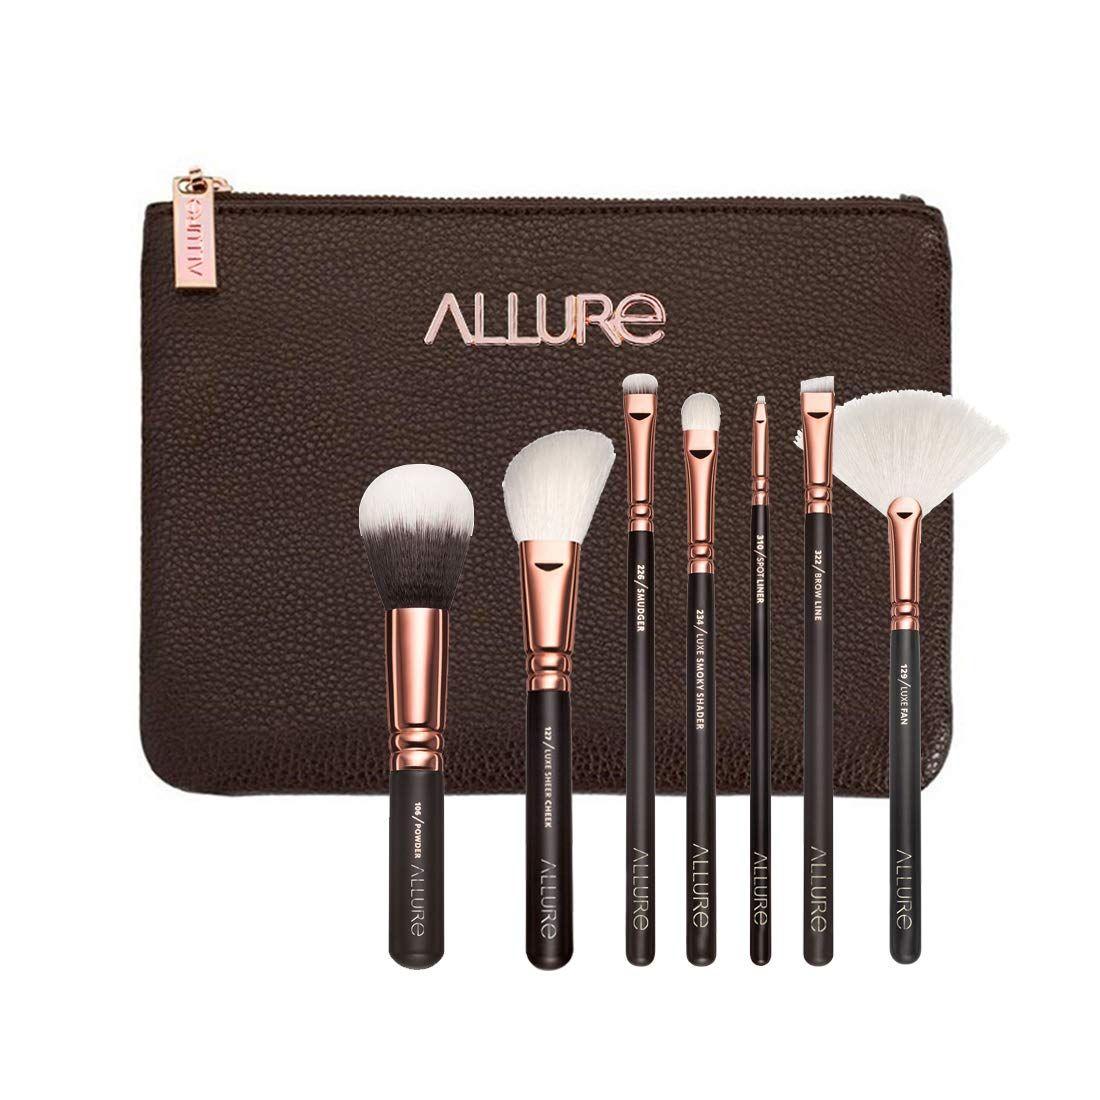 Allure Professional Makeup Brushes Kit (Rose Gold) Set